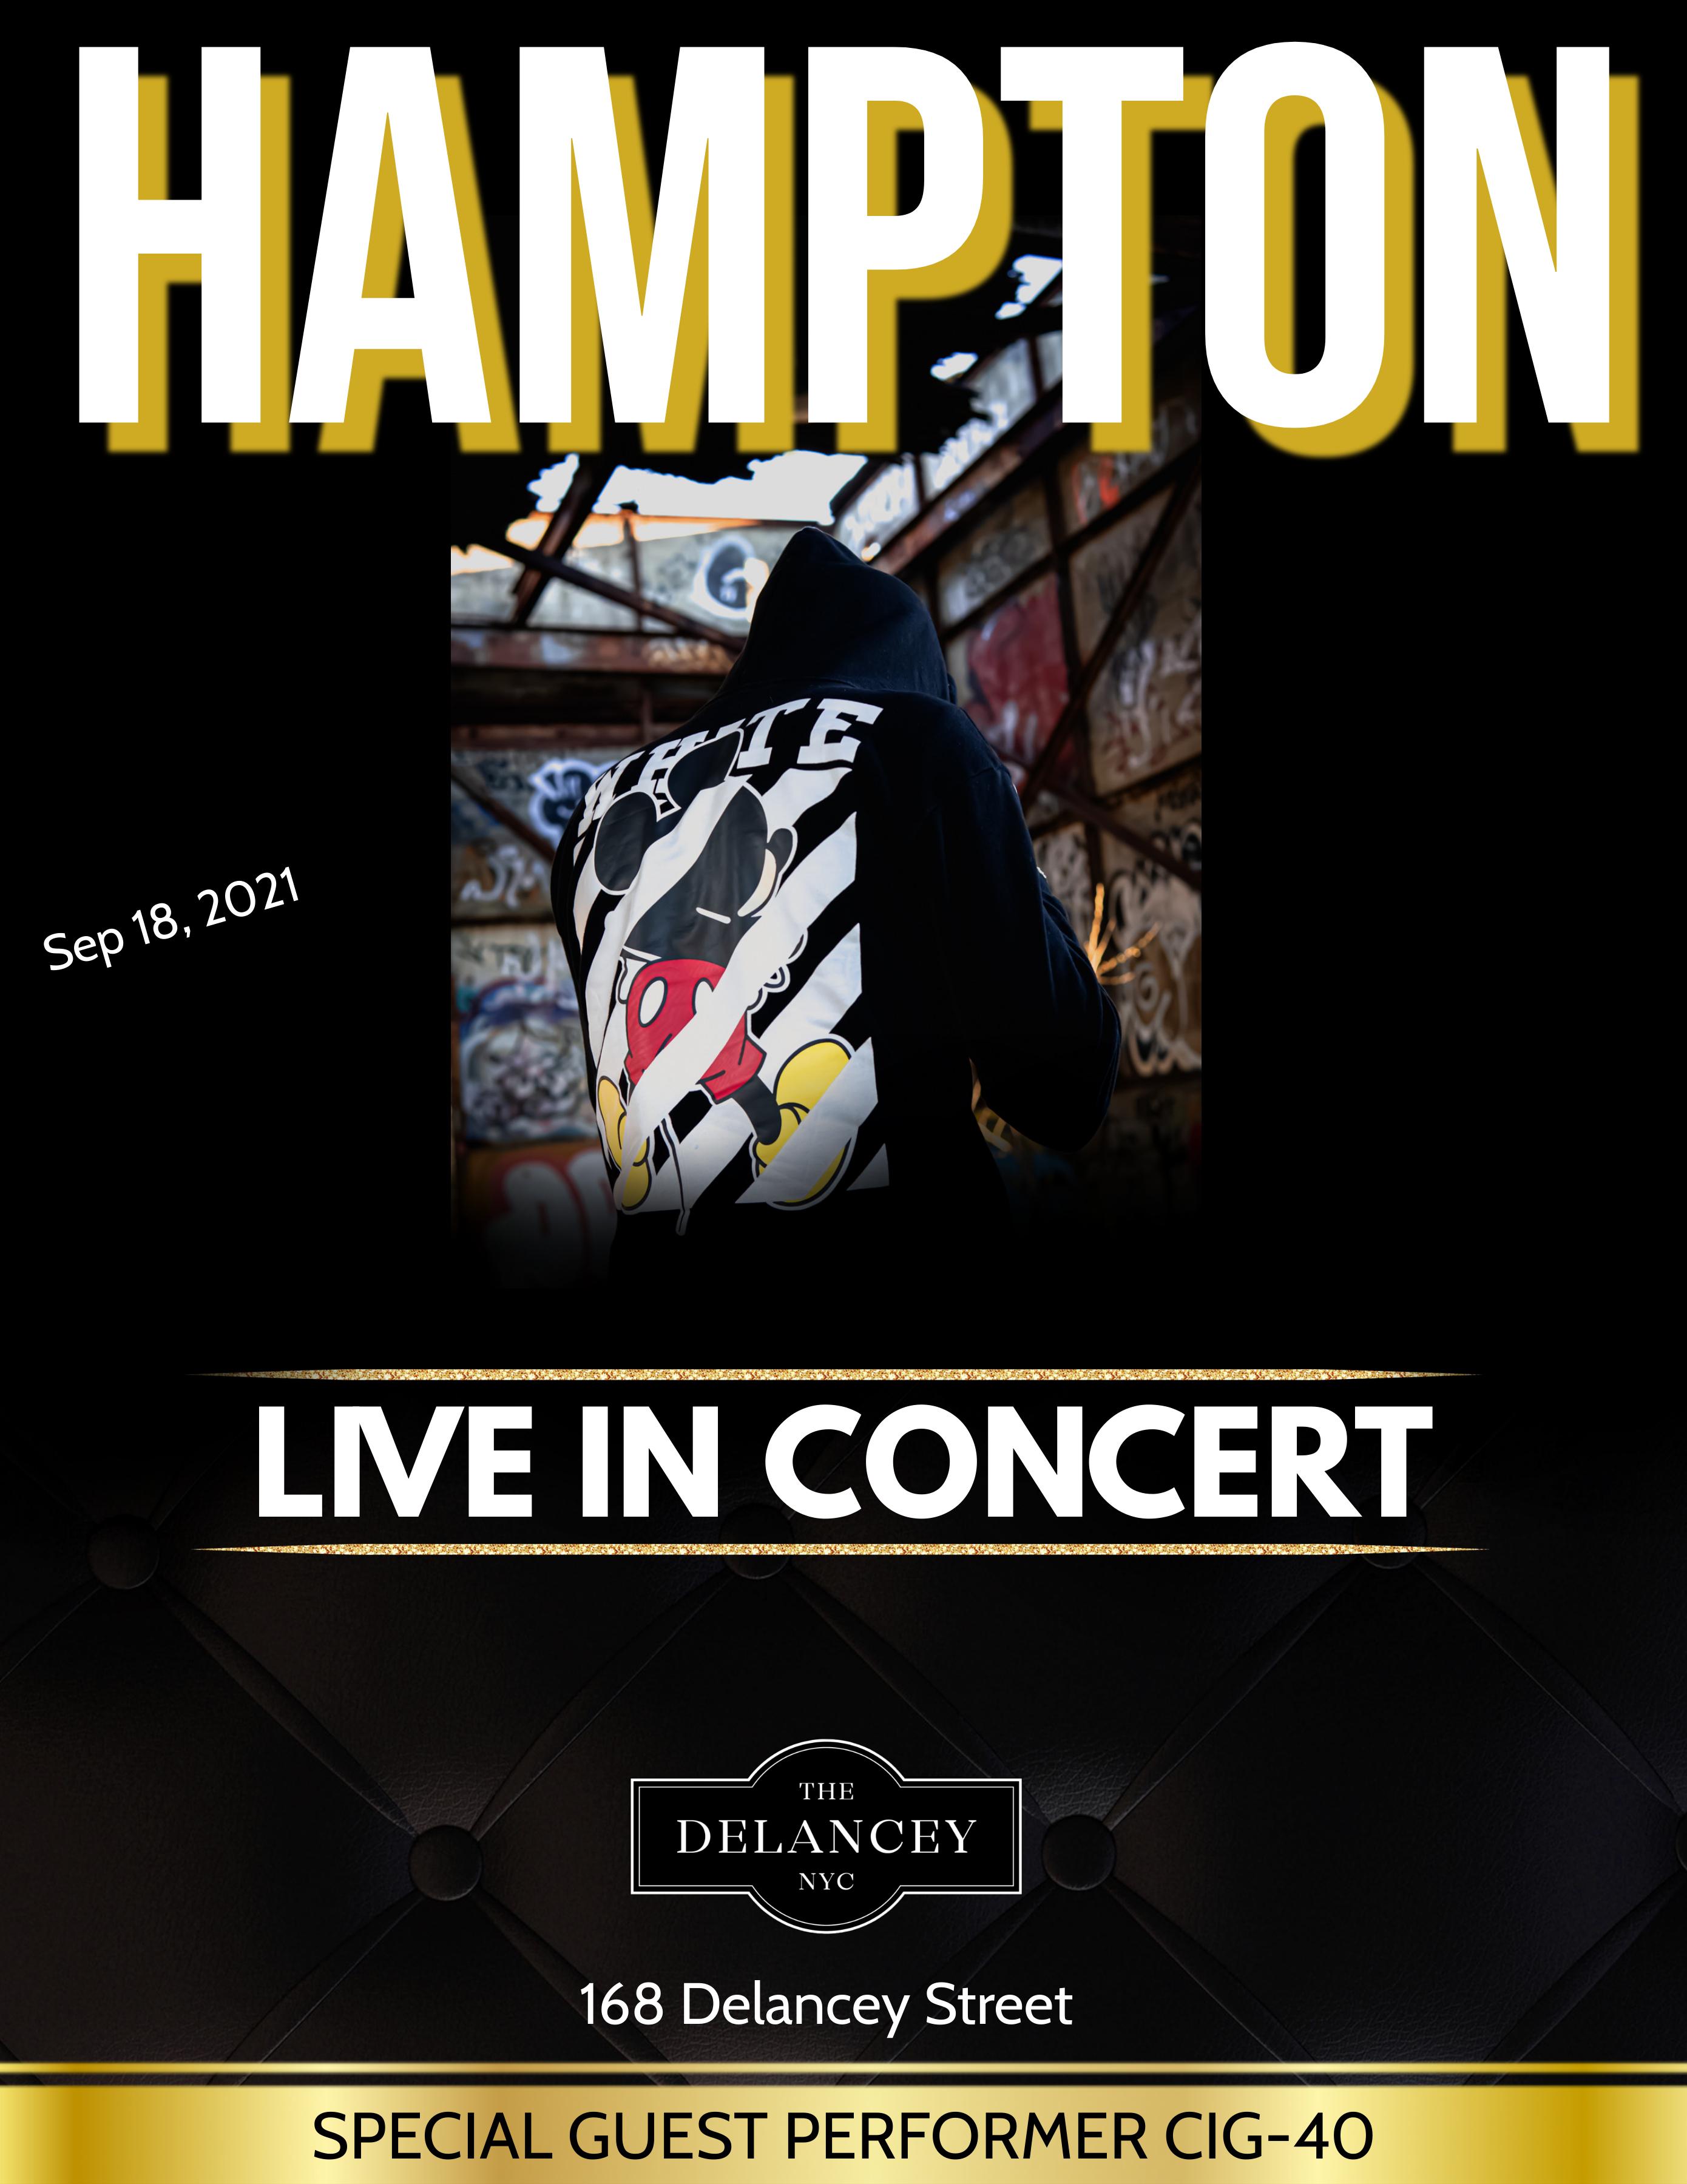 Hampton on Delancey